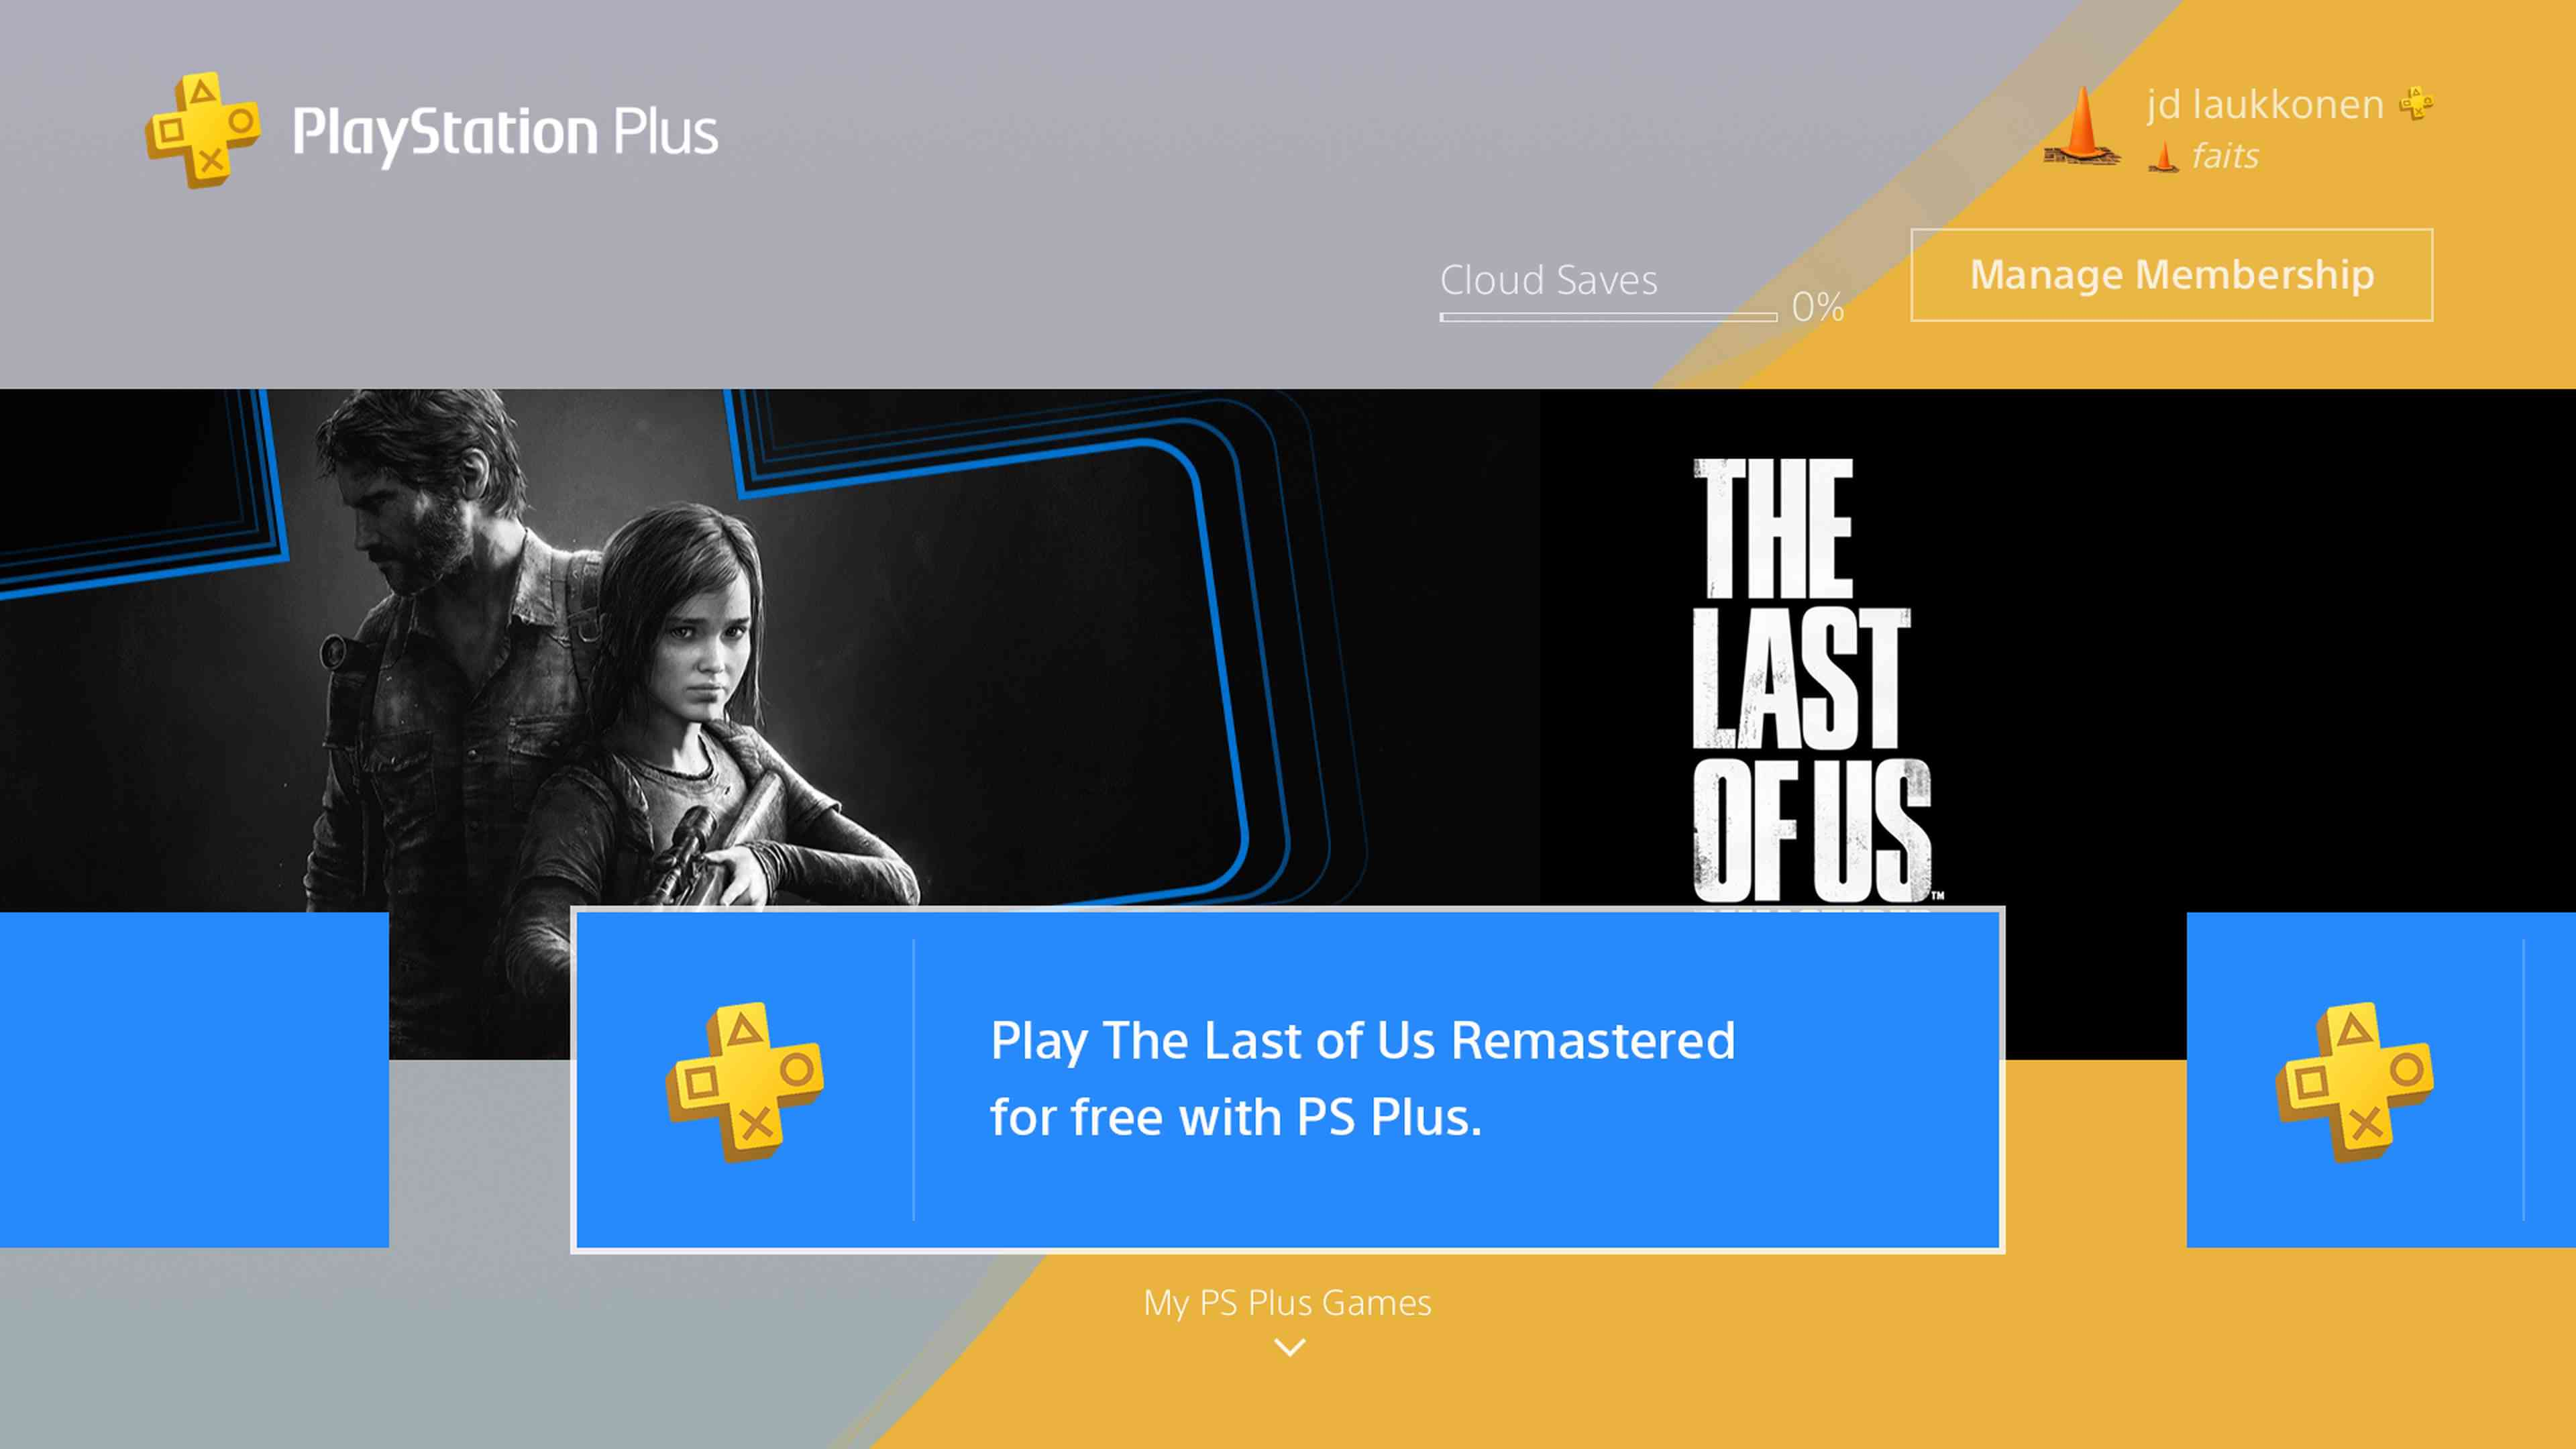 A screenshot of PS Plus free games.